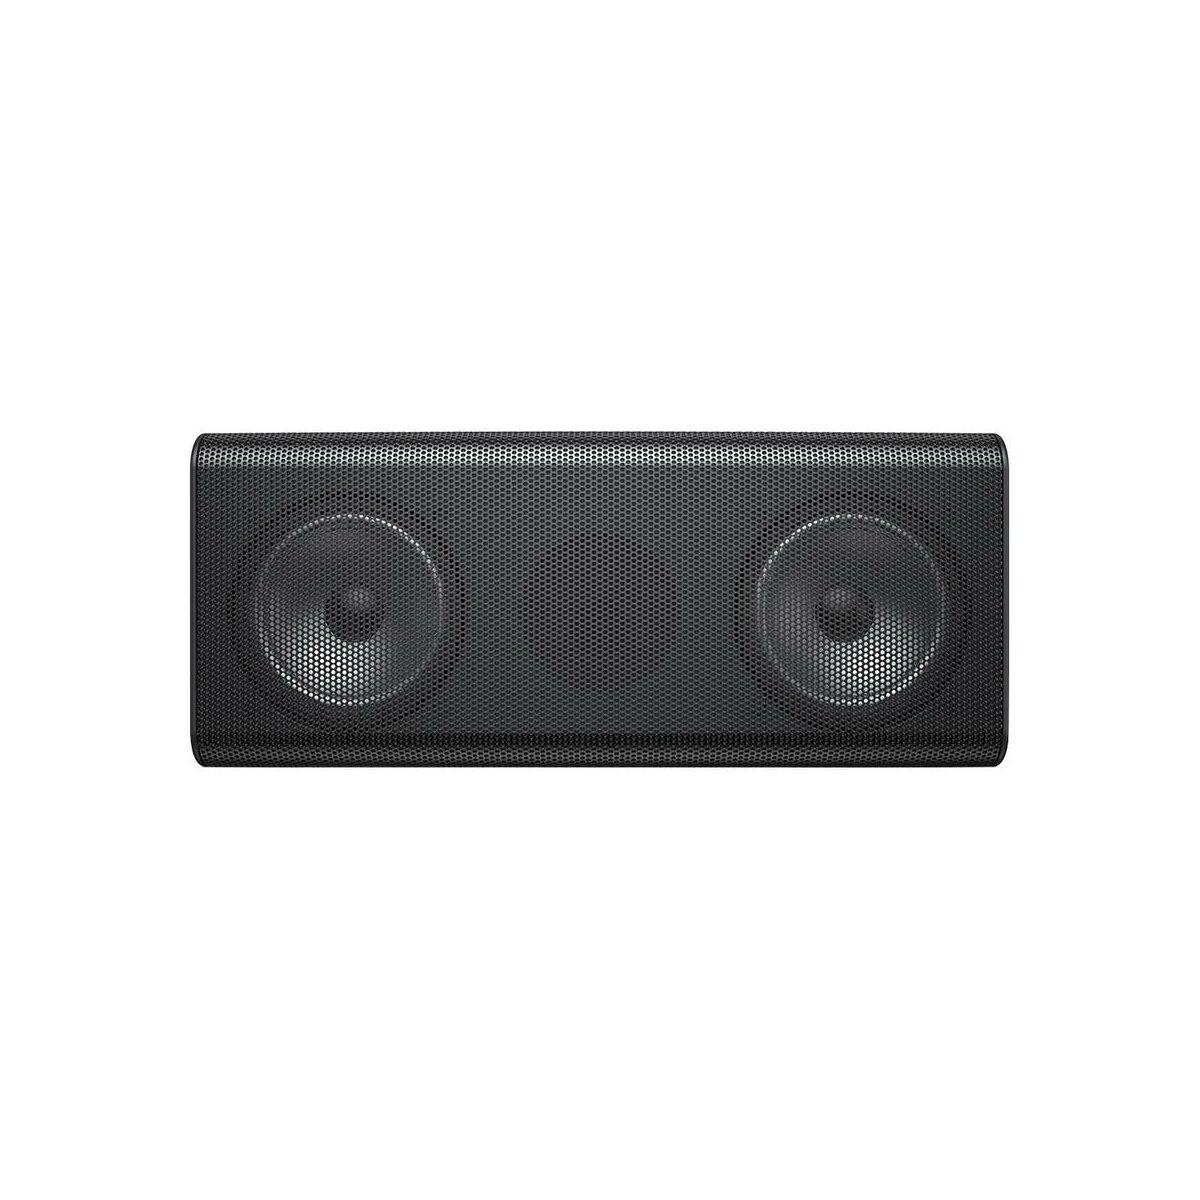 Baseus Hordozható Hangszóró, Bluetooth Encok E08, fekete (NGE08-01)